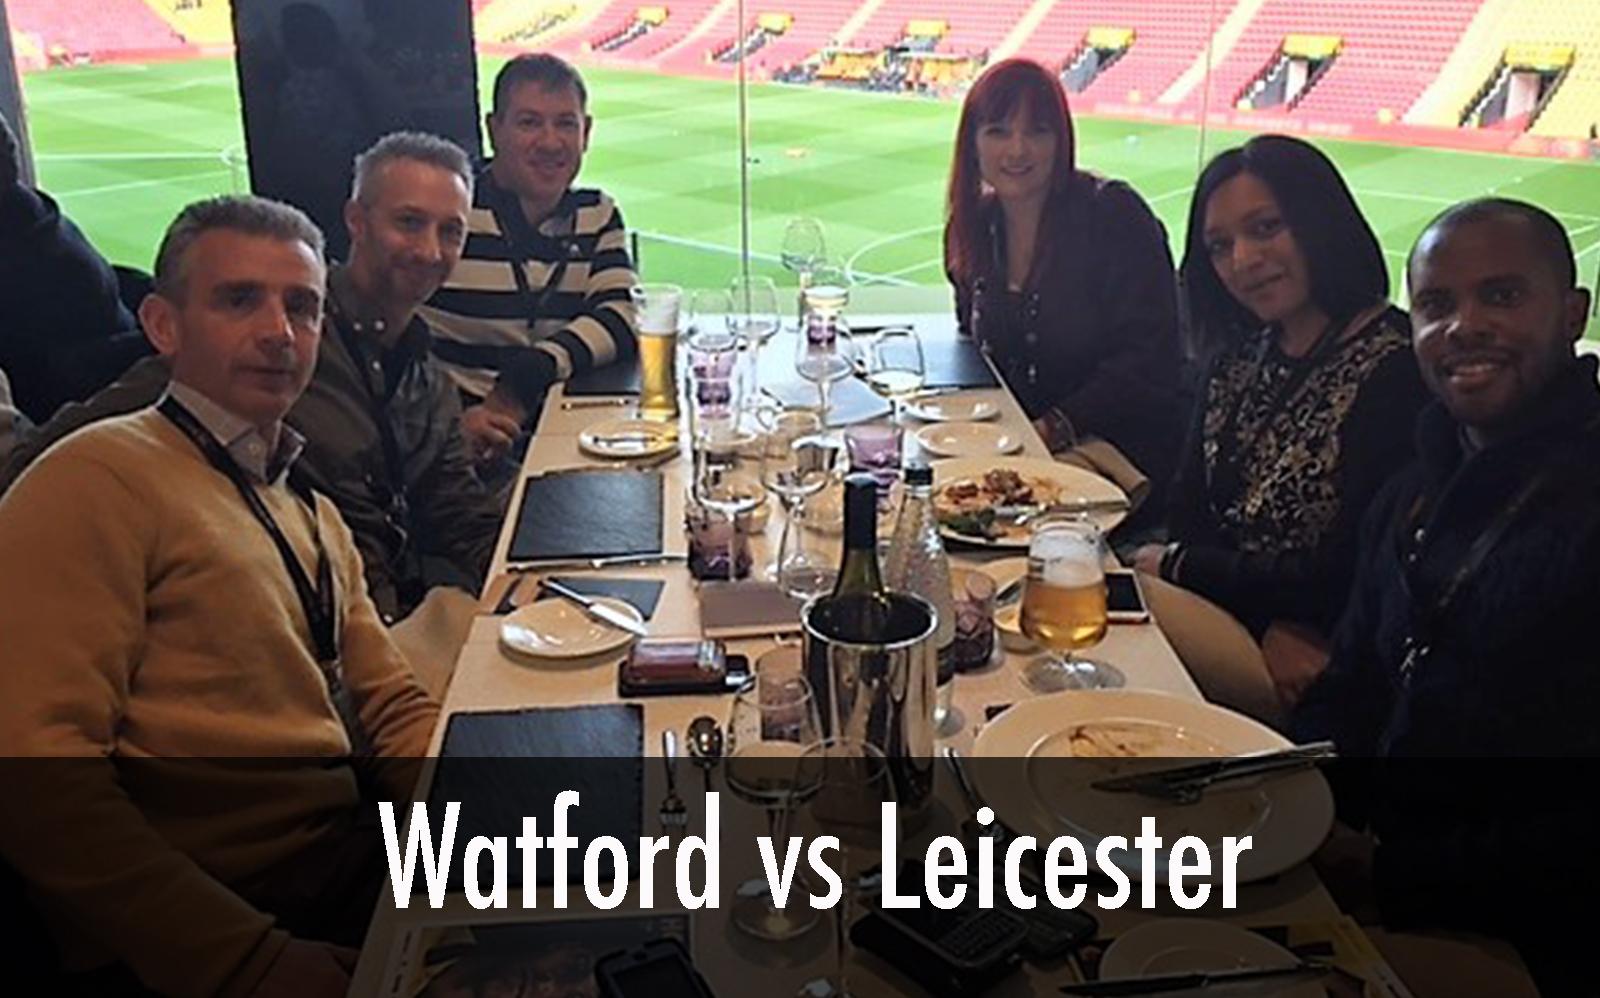 Watford vs leceister